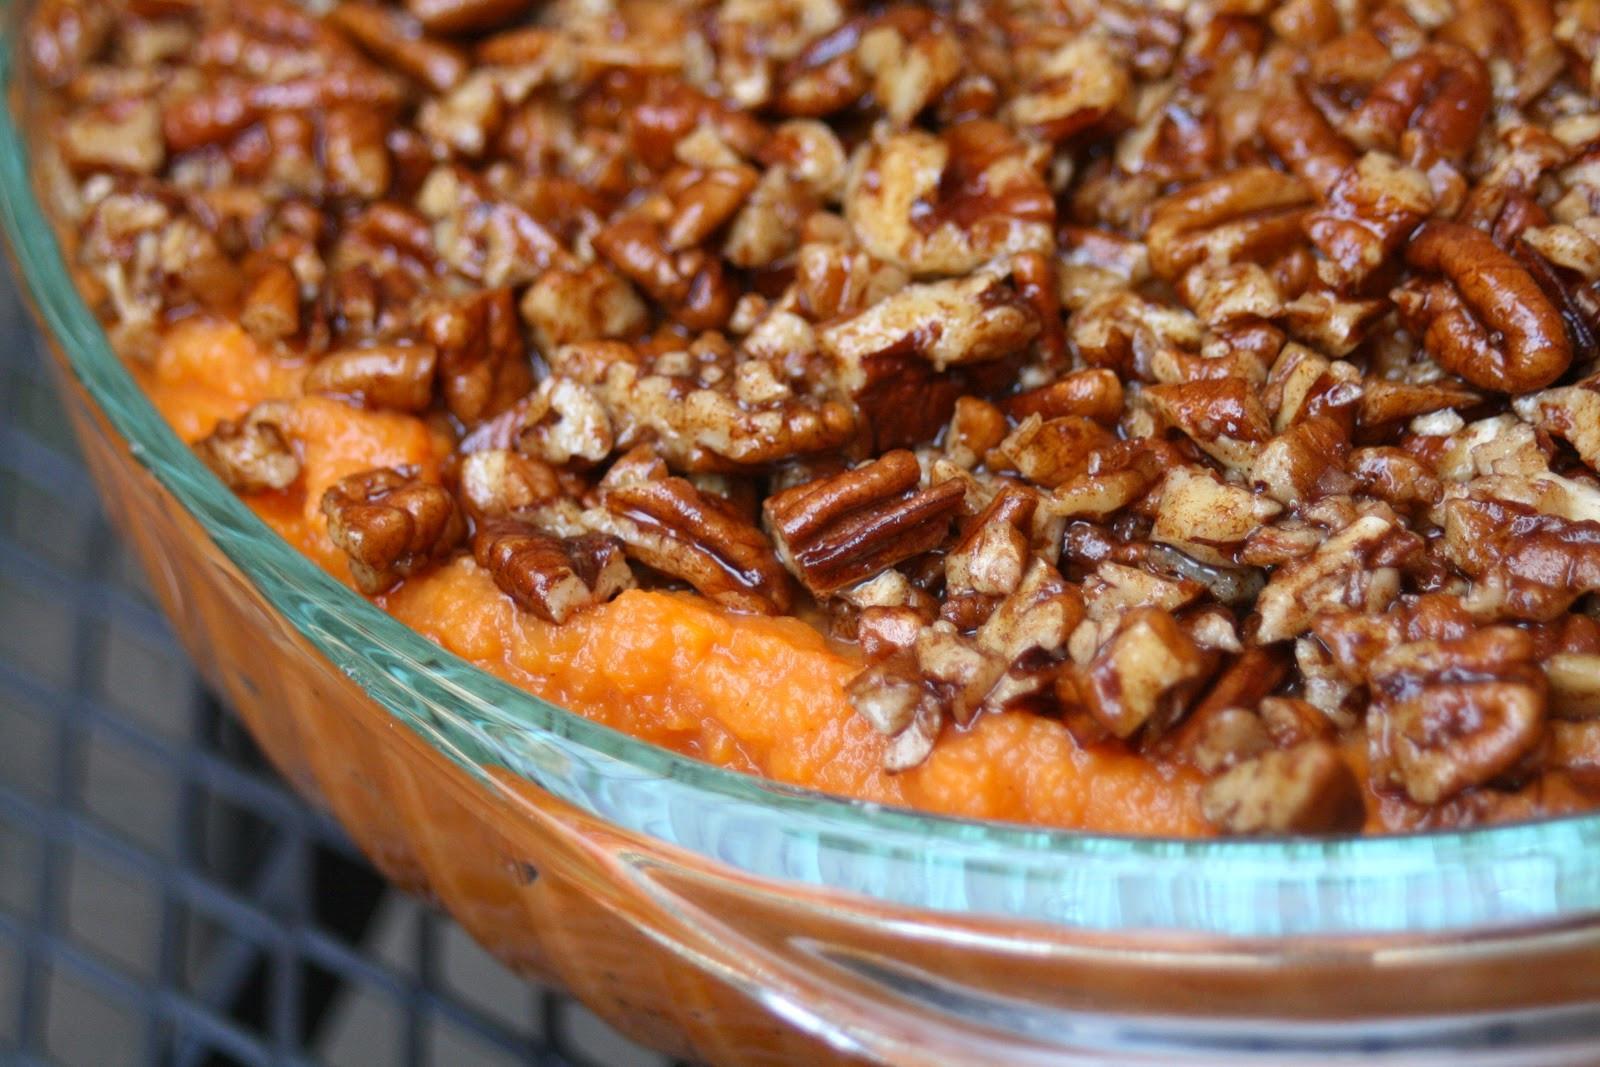 Sweet Potato Paleo  Paleo Diet Recipes Paleo Sweet Potato Casserole and the